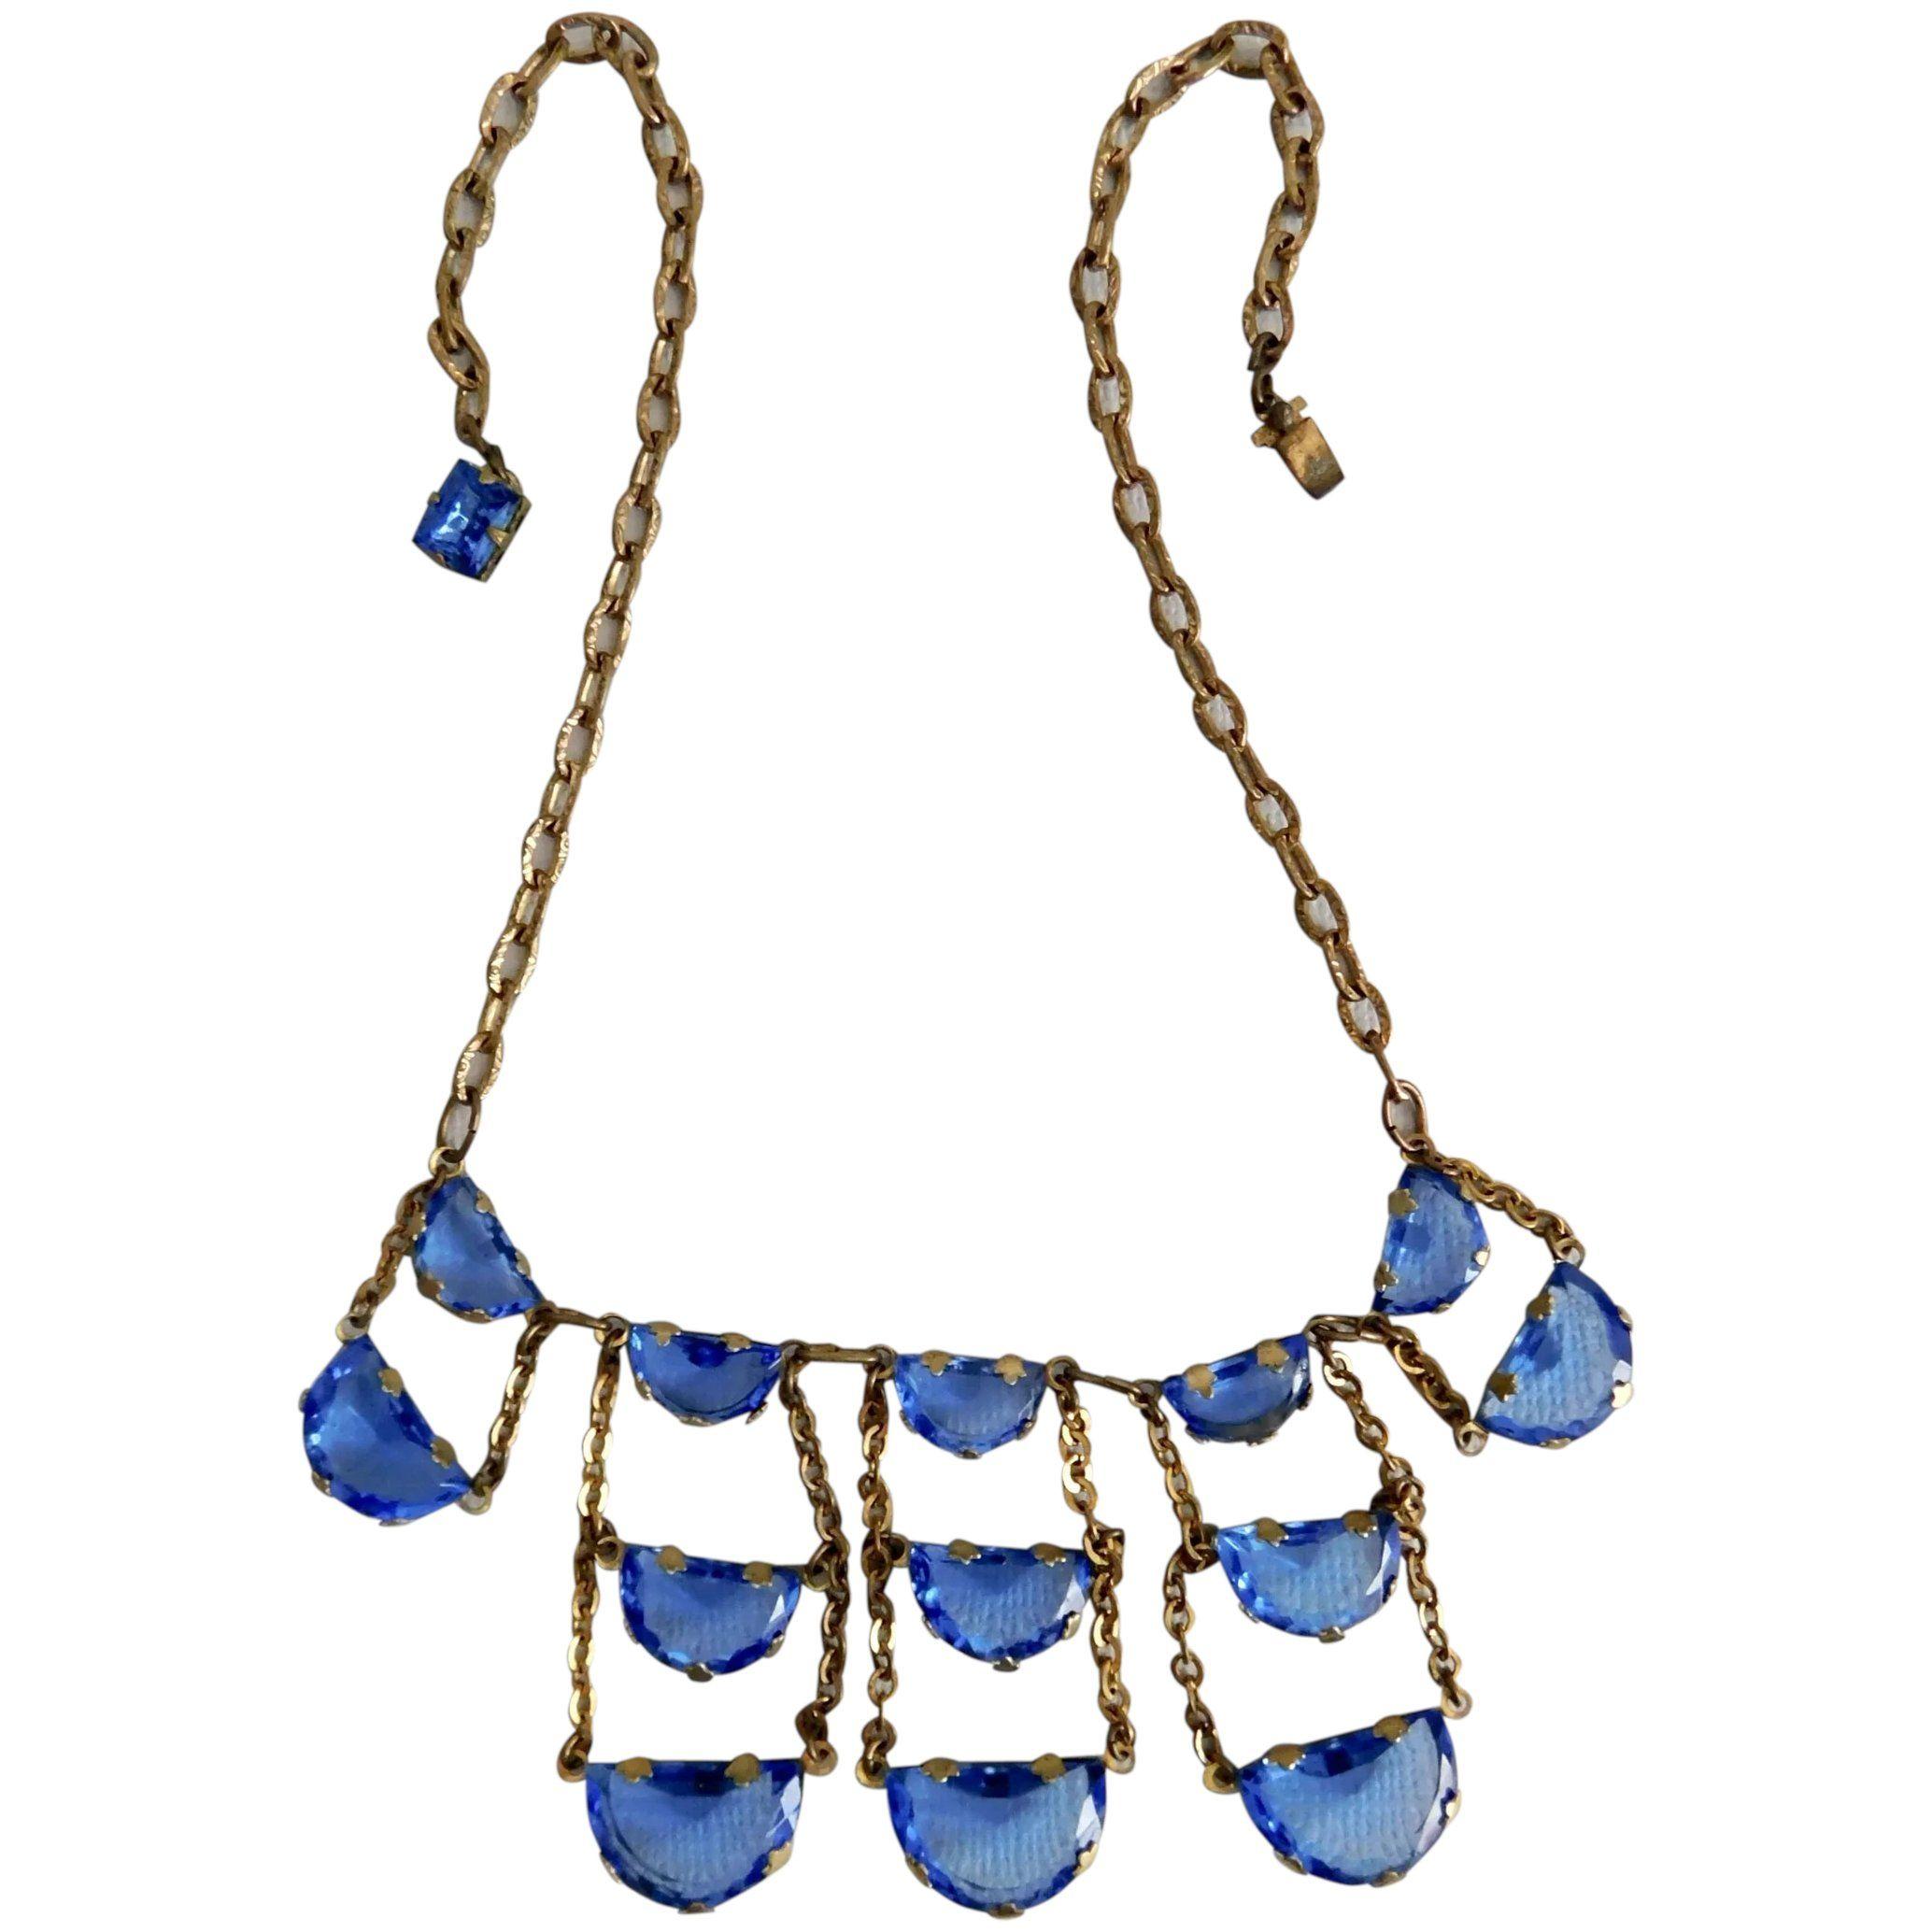 Art deco necklace art deco jewellery vauxhall glass necklace long blue original 1920s jewellery art deco original blue glass necklace